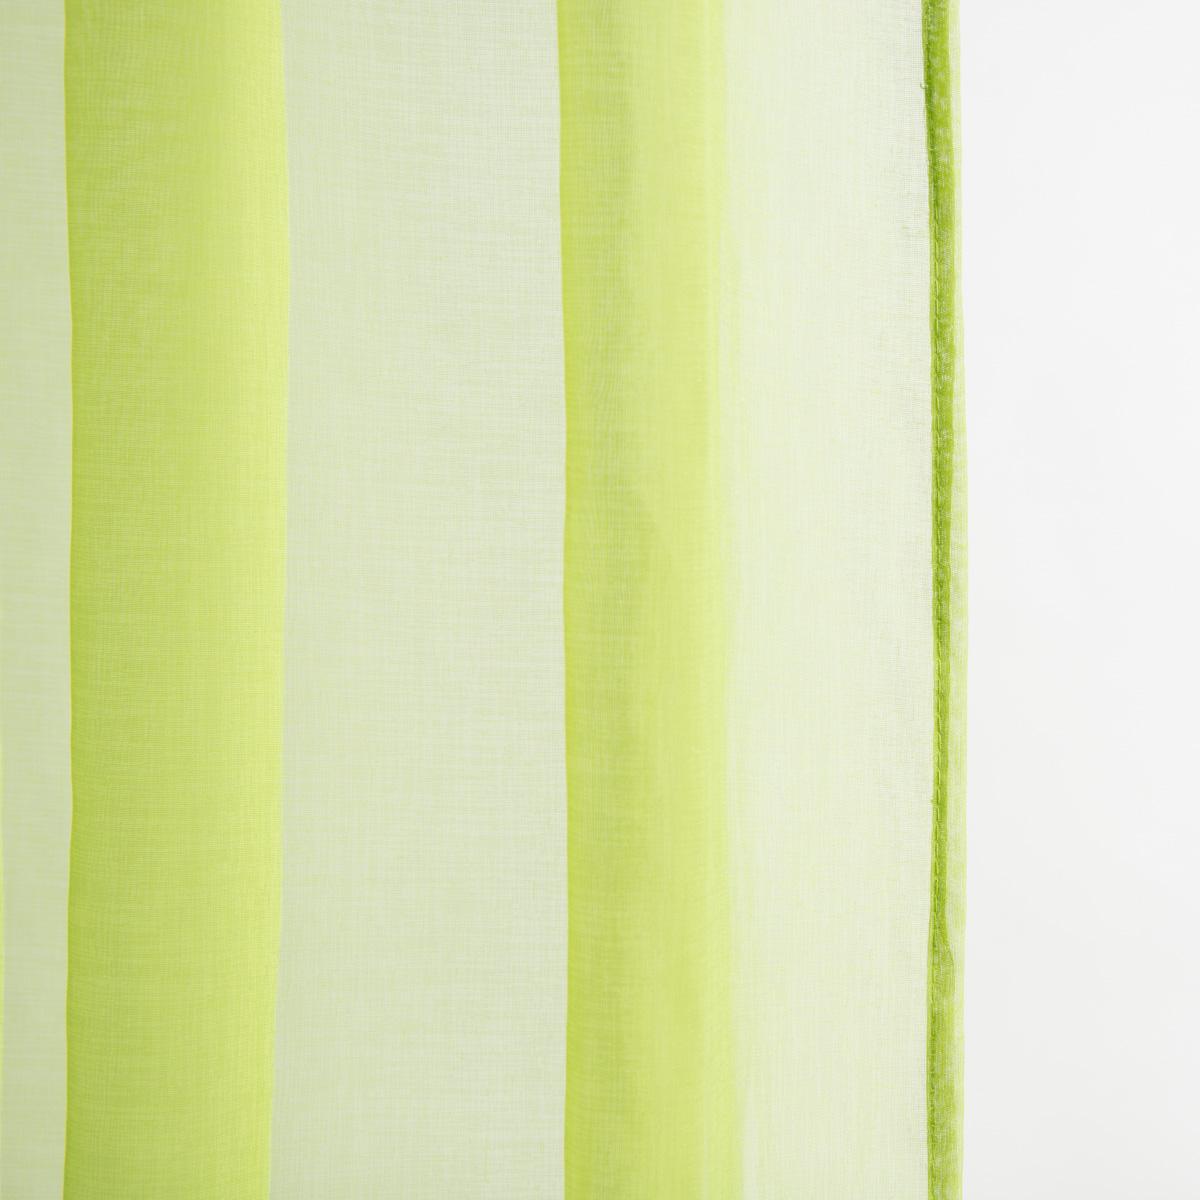 Ösenschal Fertiggardine CRISS CROSS apfelgrün 135x245cm